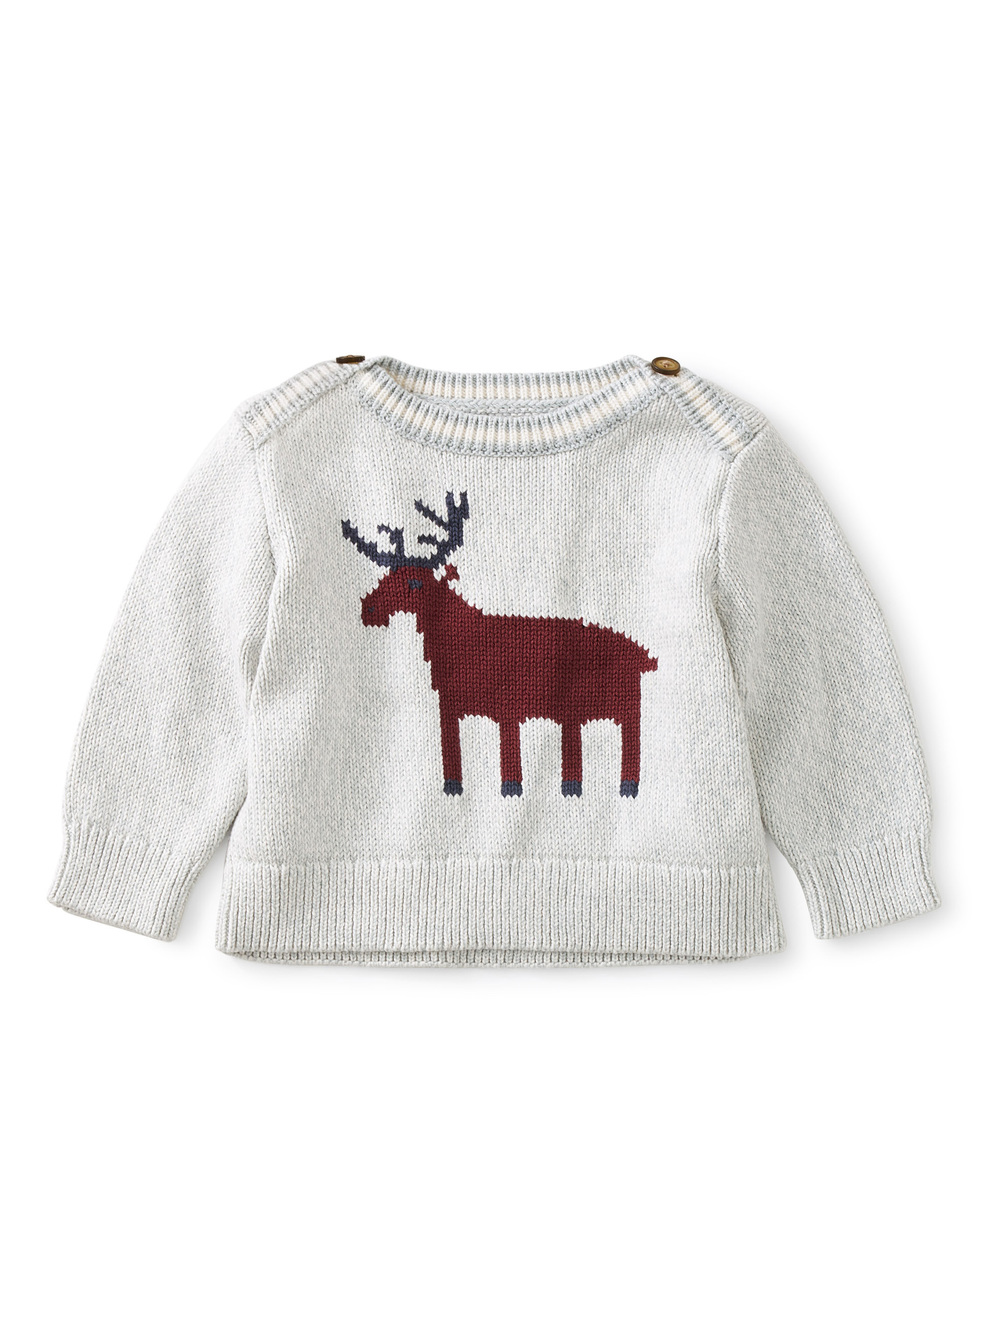 Moose Baby Sweater